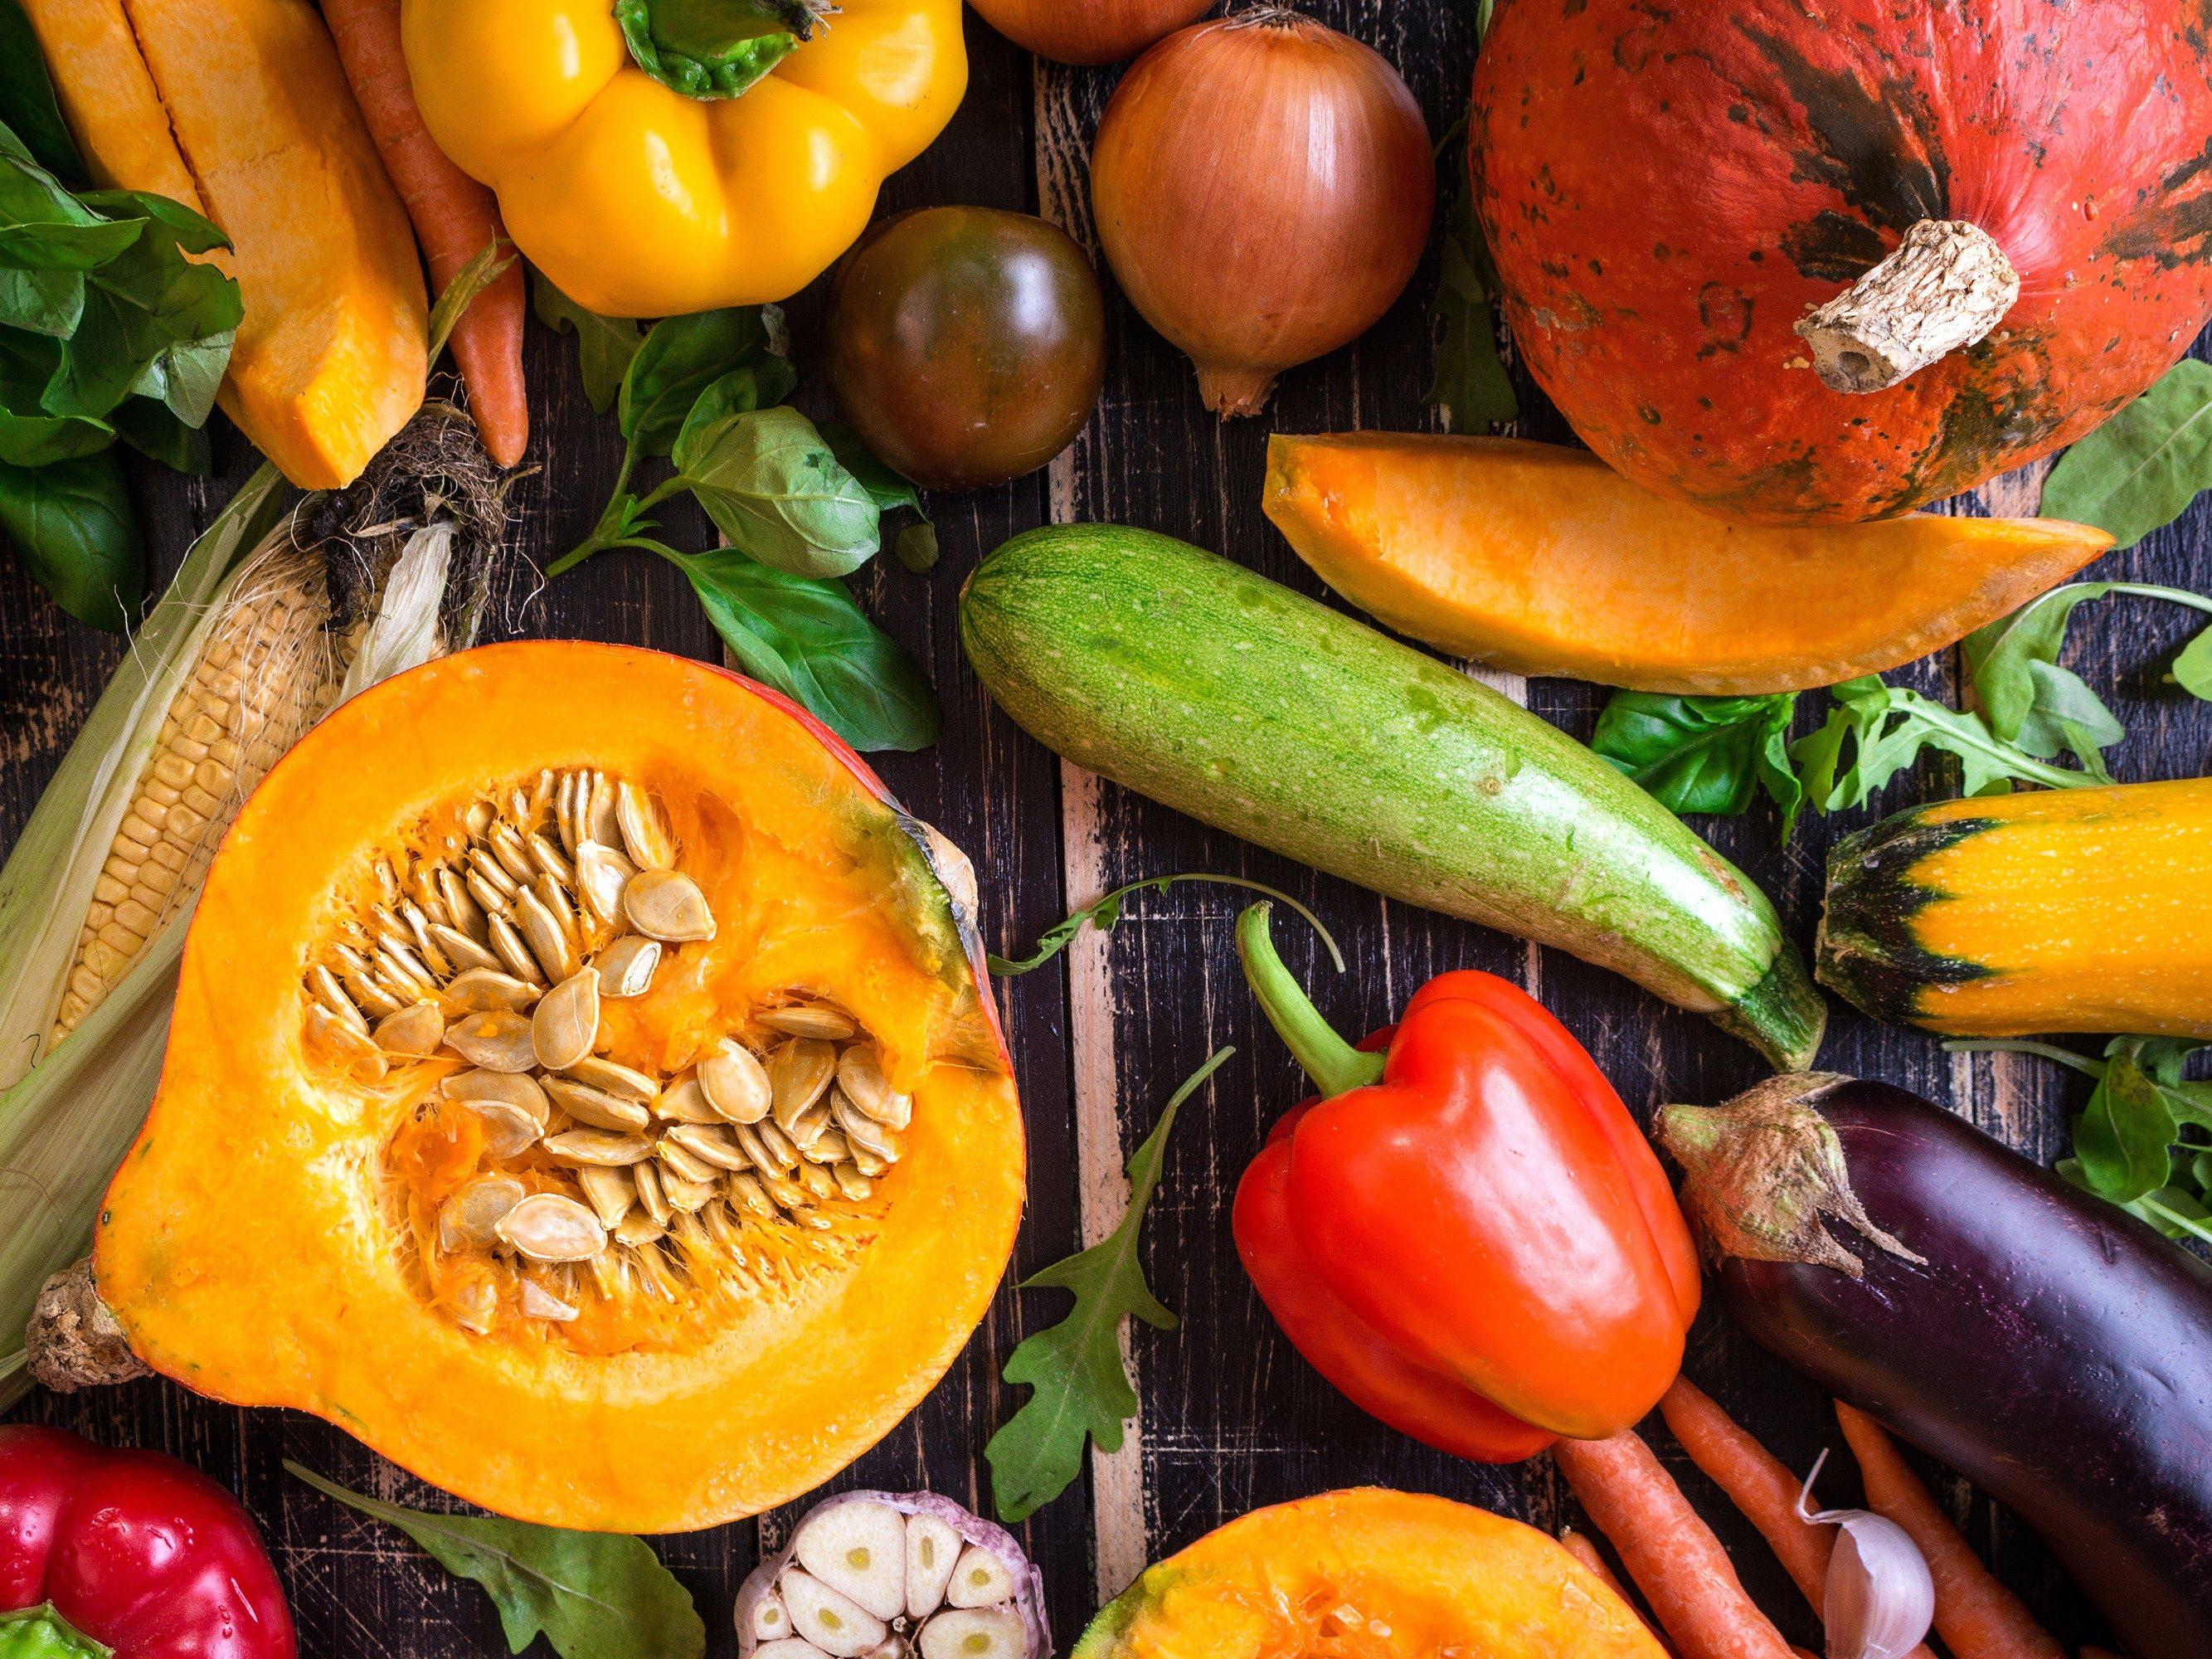 Healthy Holiday Tip: Eat Plenty of Vegetables